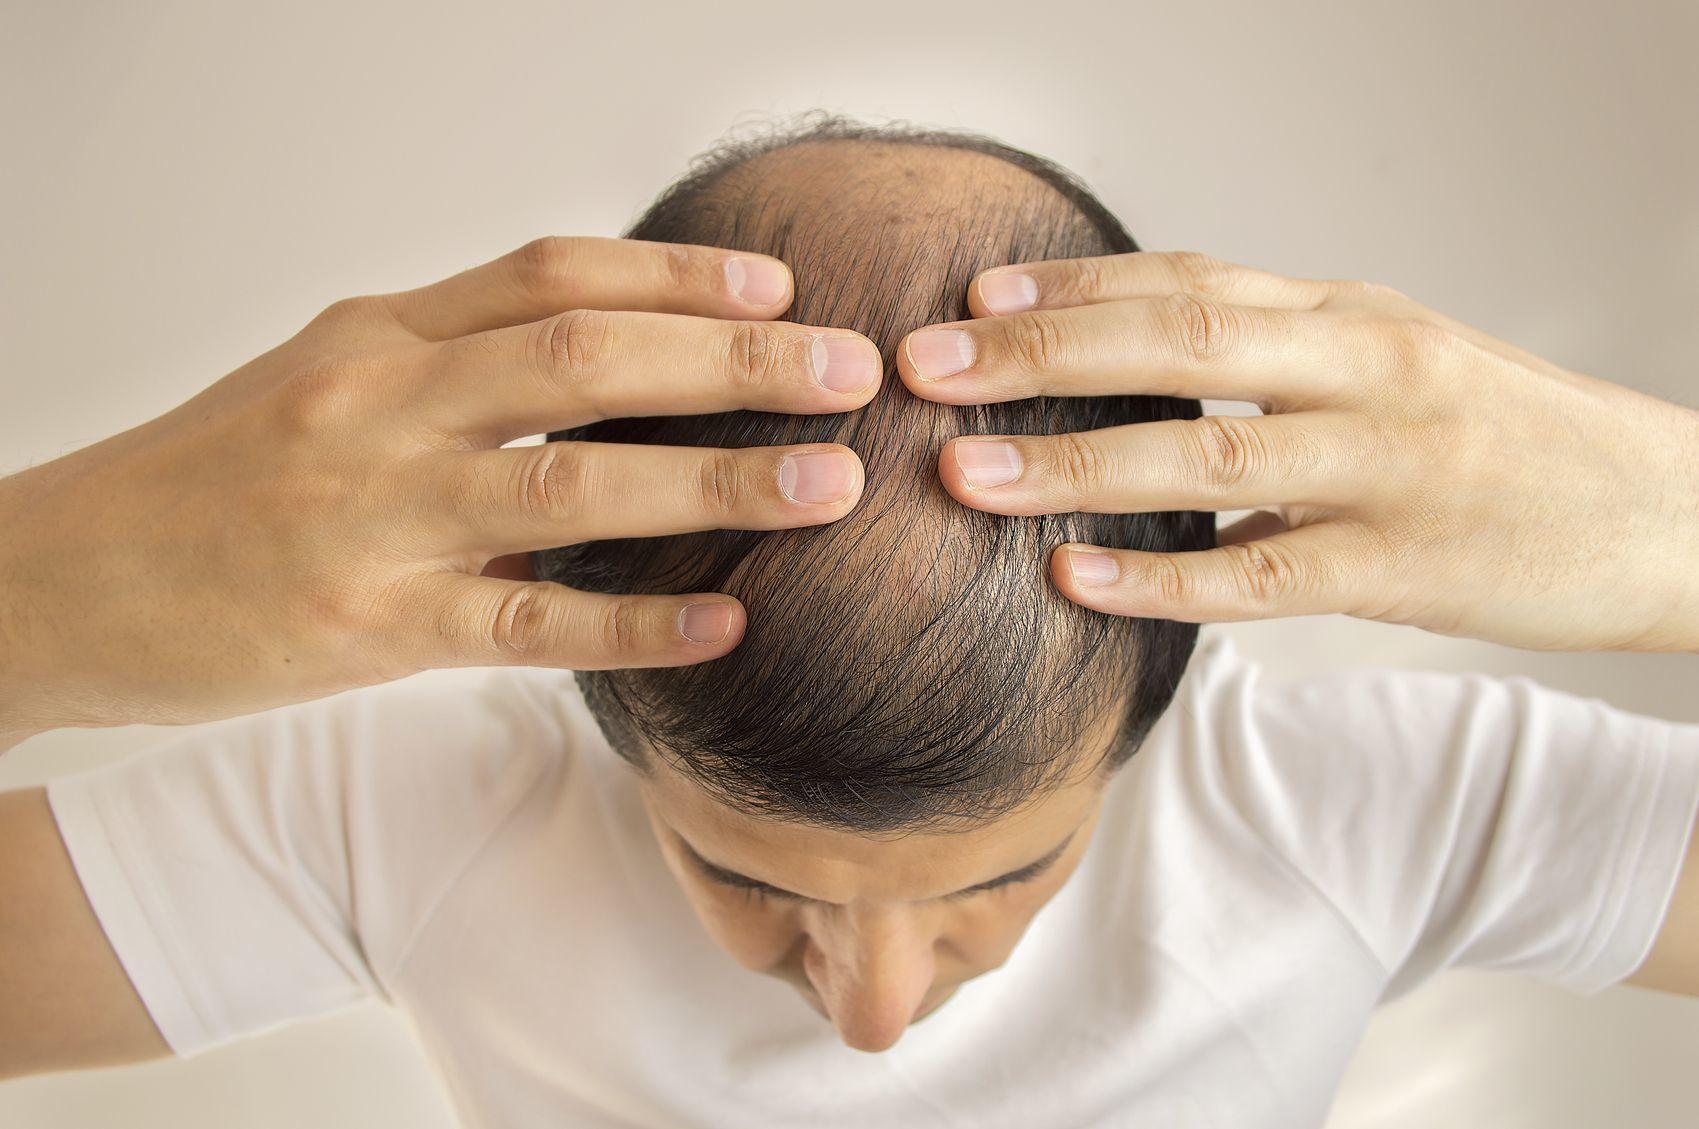 AGA若ハゲの原因 AGA発症の最大の要因!男性ホルモンDHT(ジヒドロテストステロン)